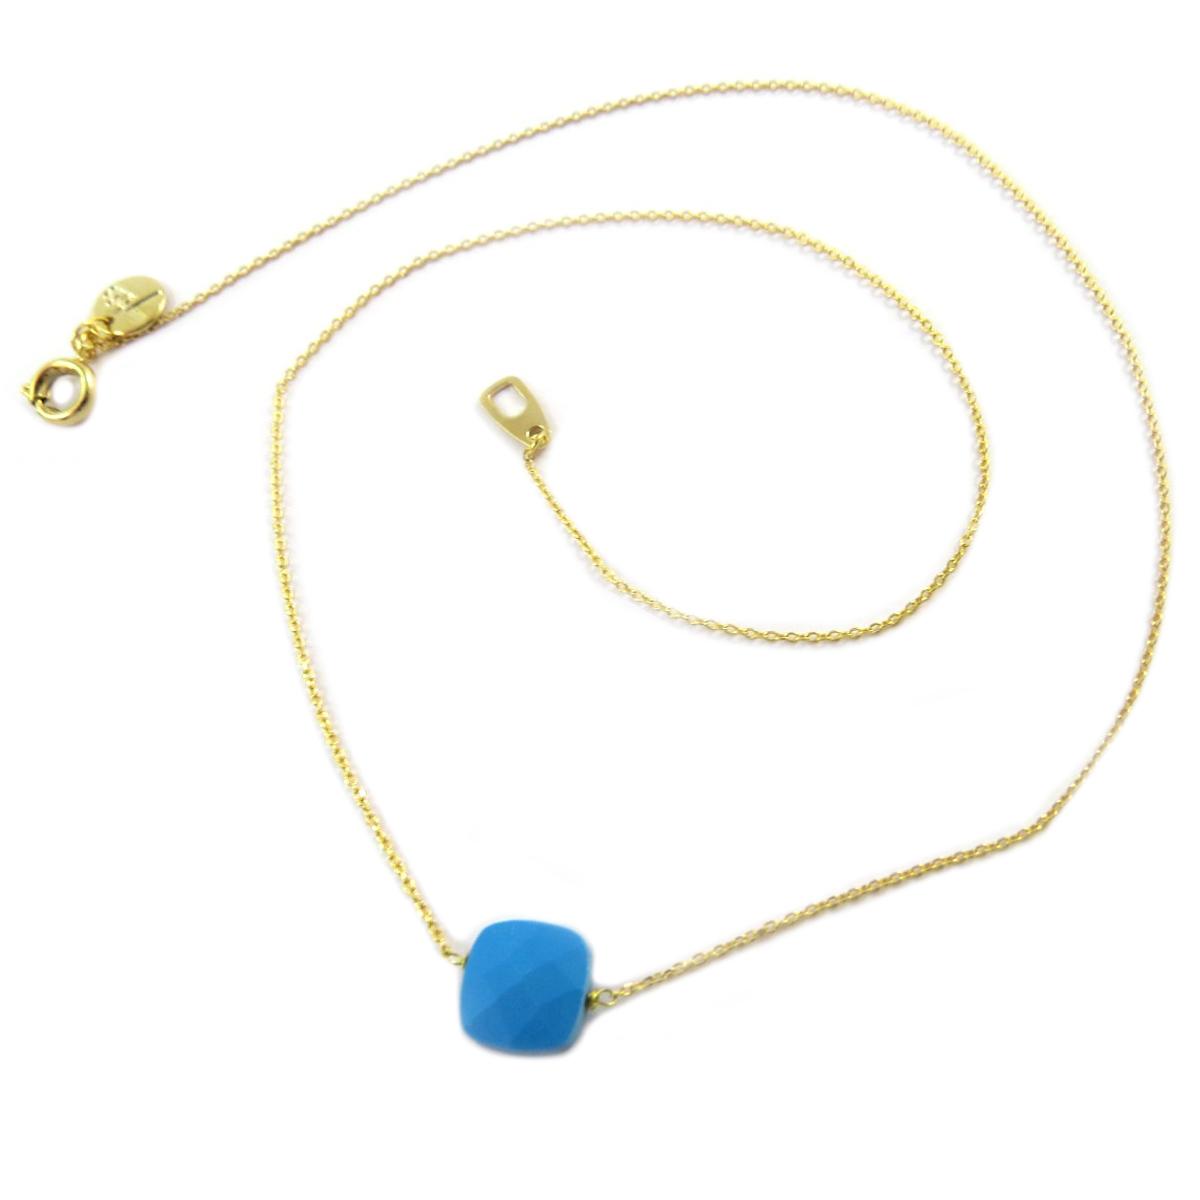 Collier artisanal \'Boho\' turquoise doré - 14x14 mm - [Q1422]